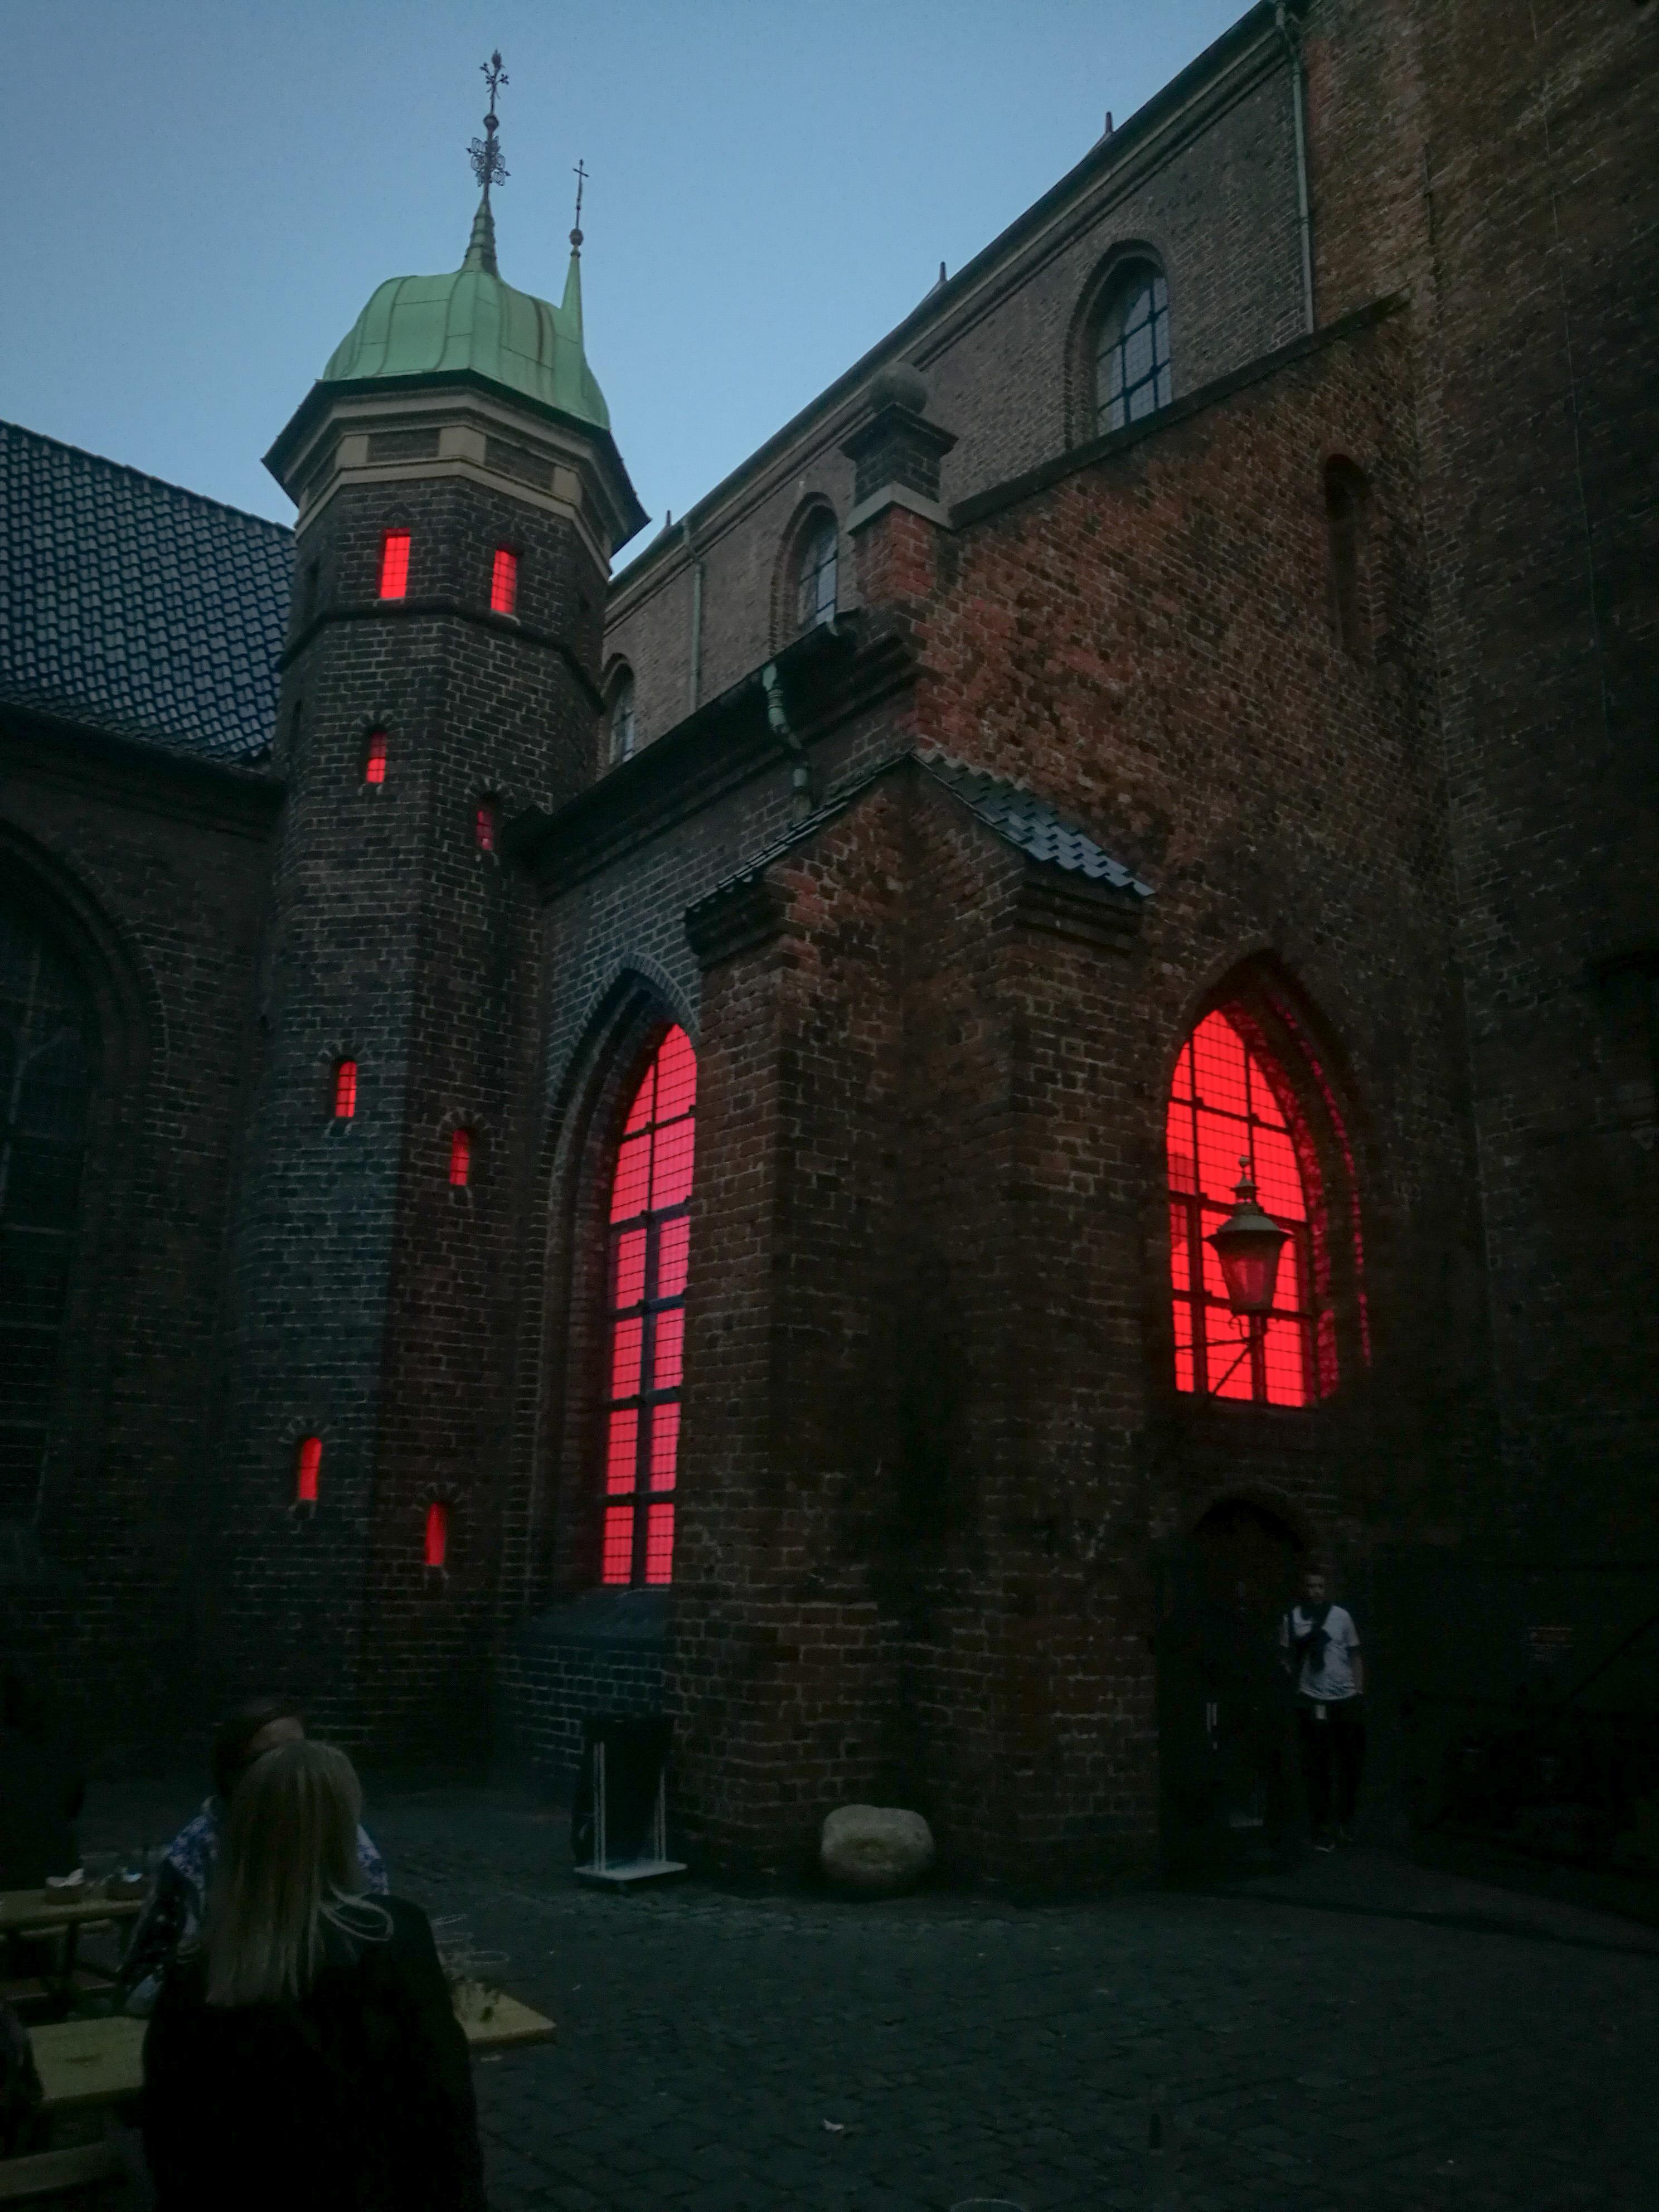 Lighting up Nikolaj Kunsthal & Square